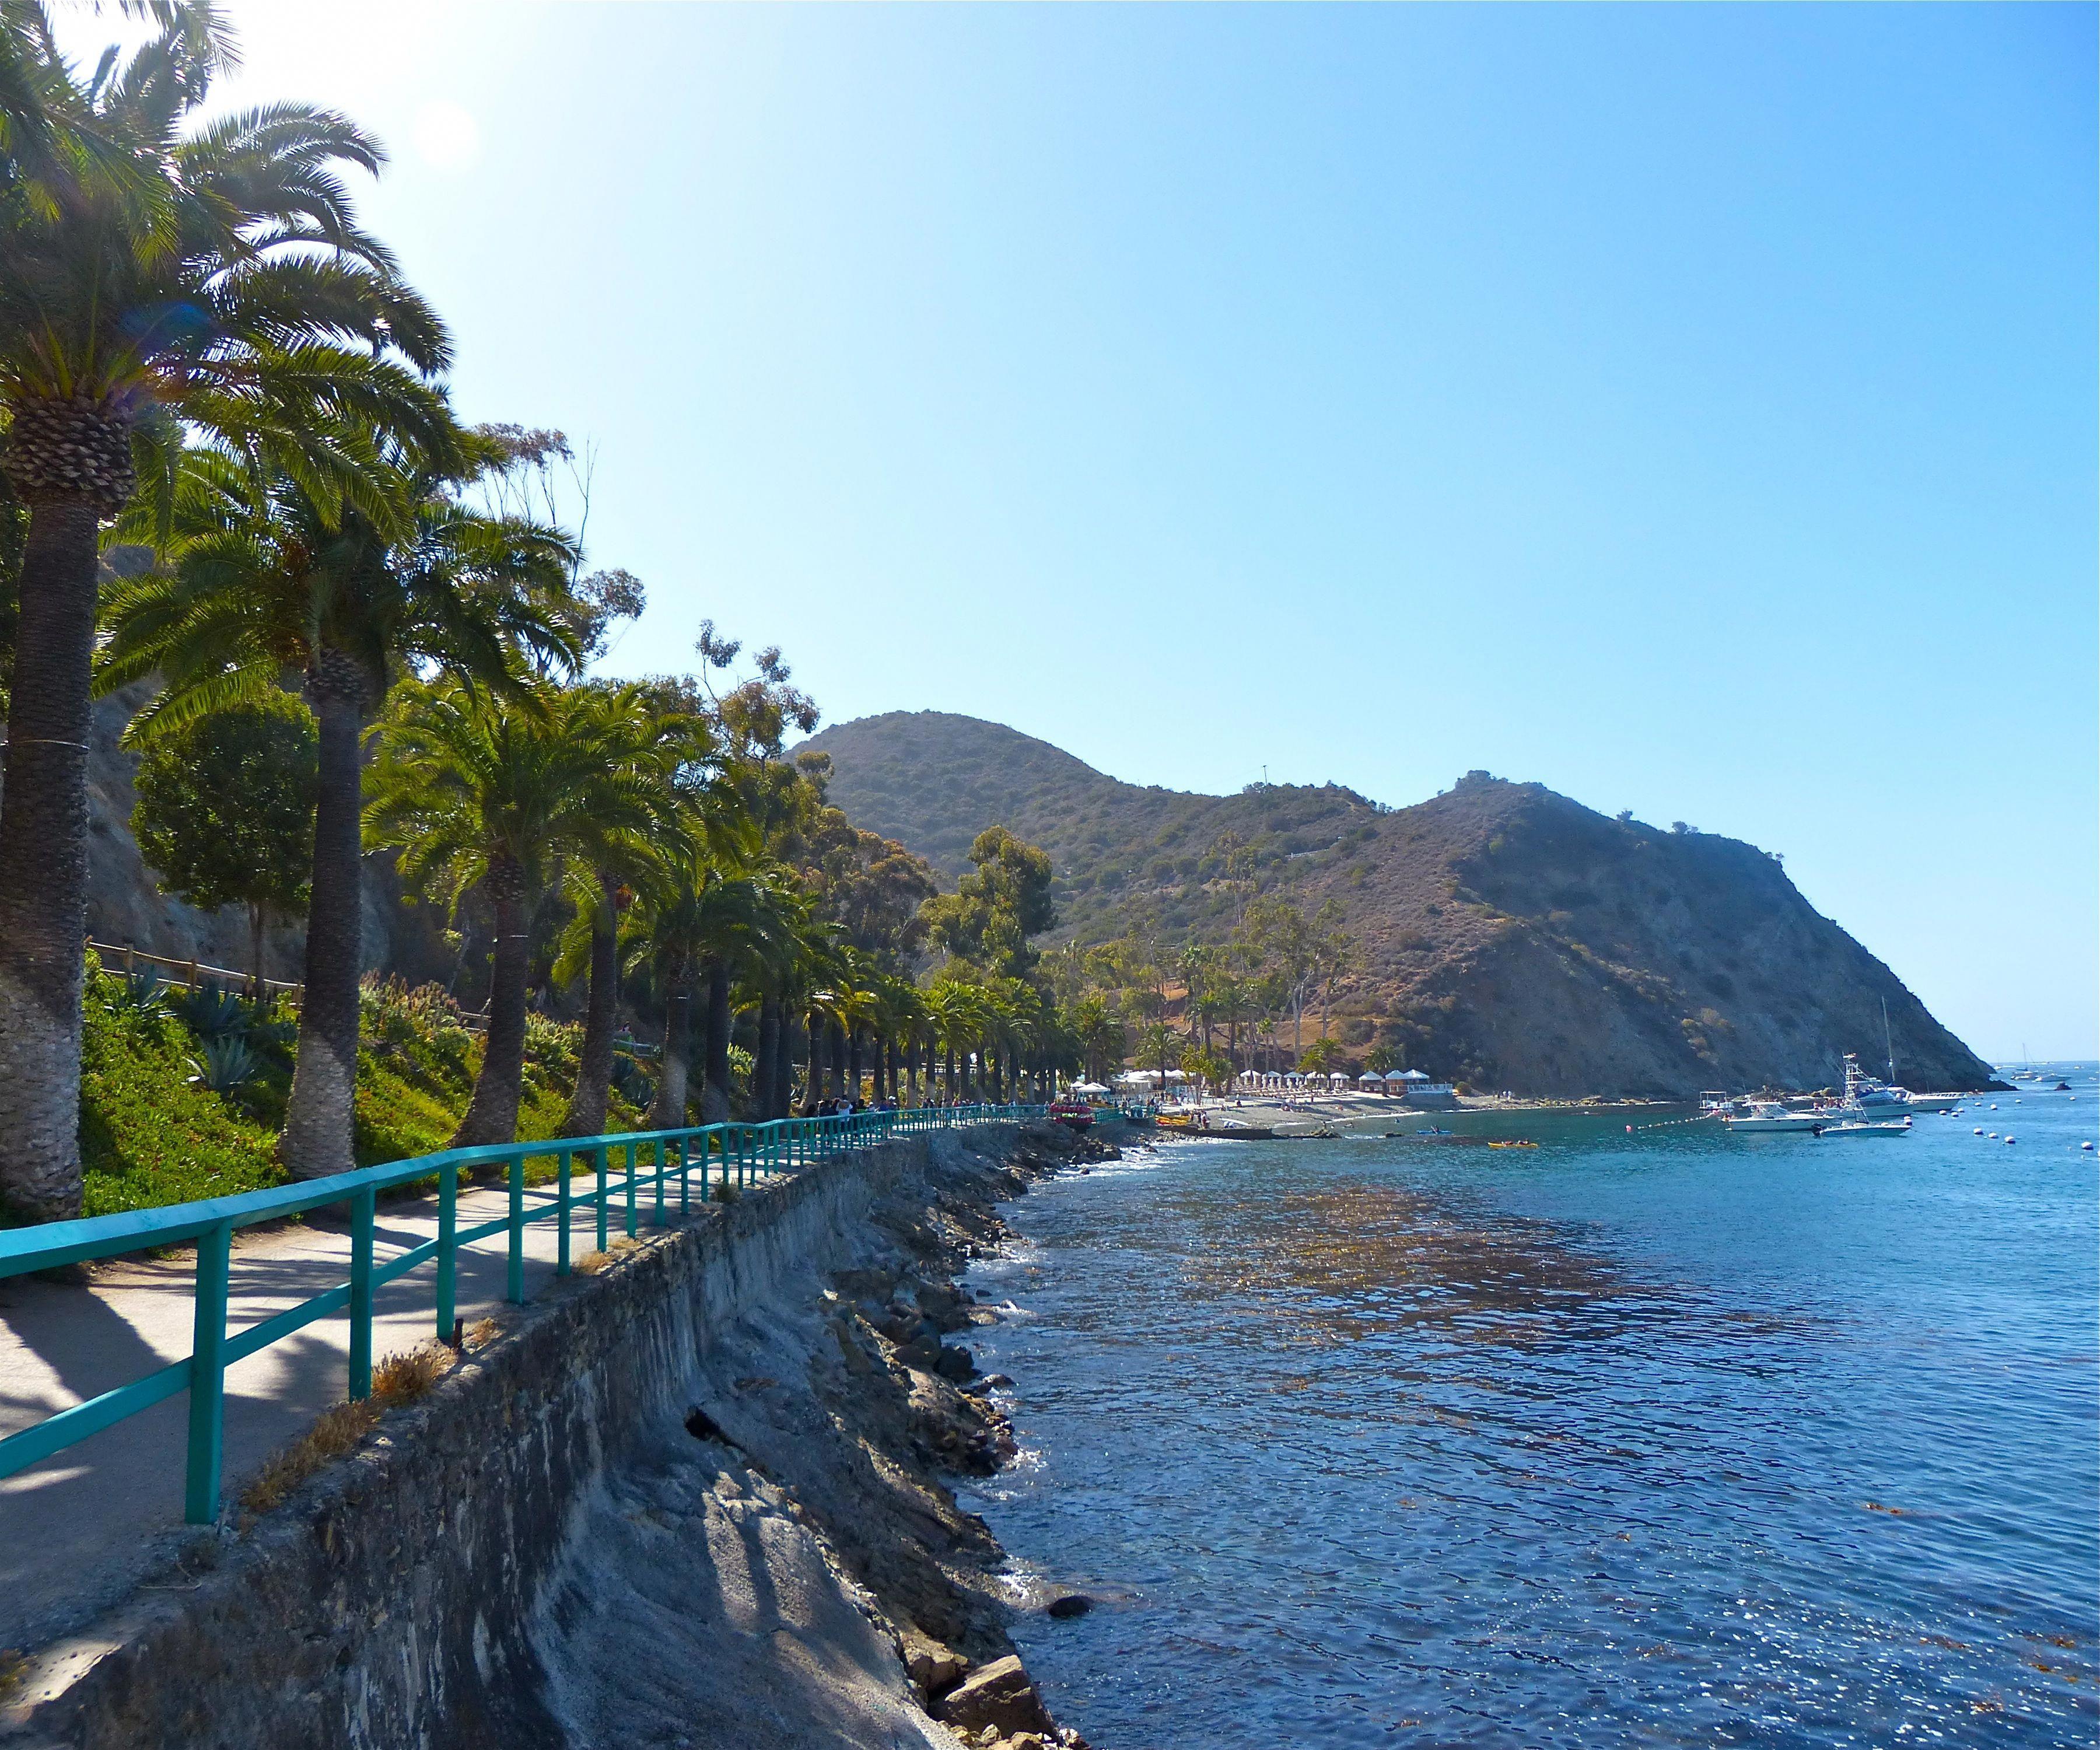 A walk from the Casino to Descano Bay, Catalina, CA